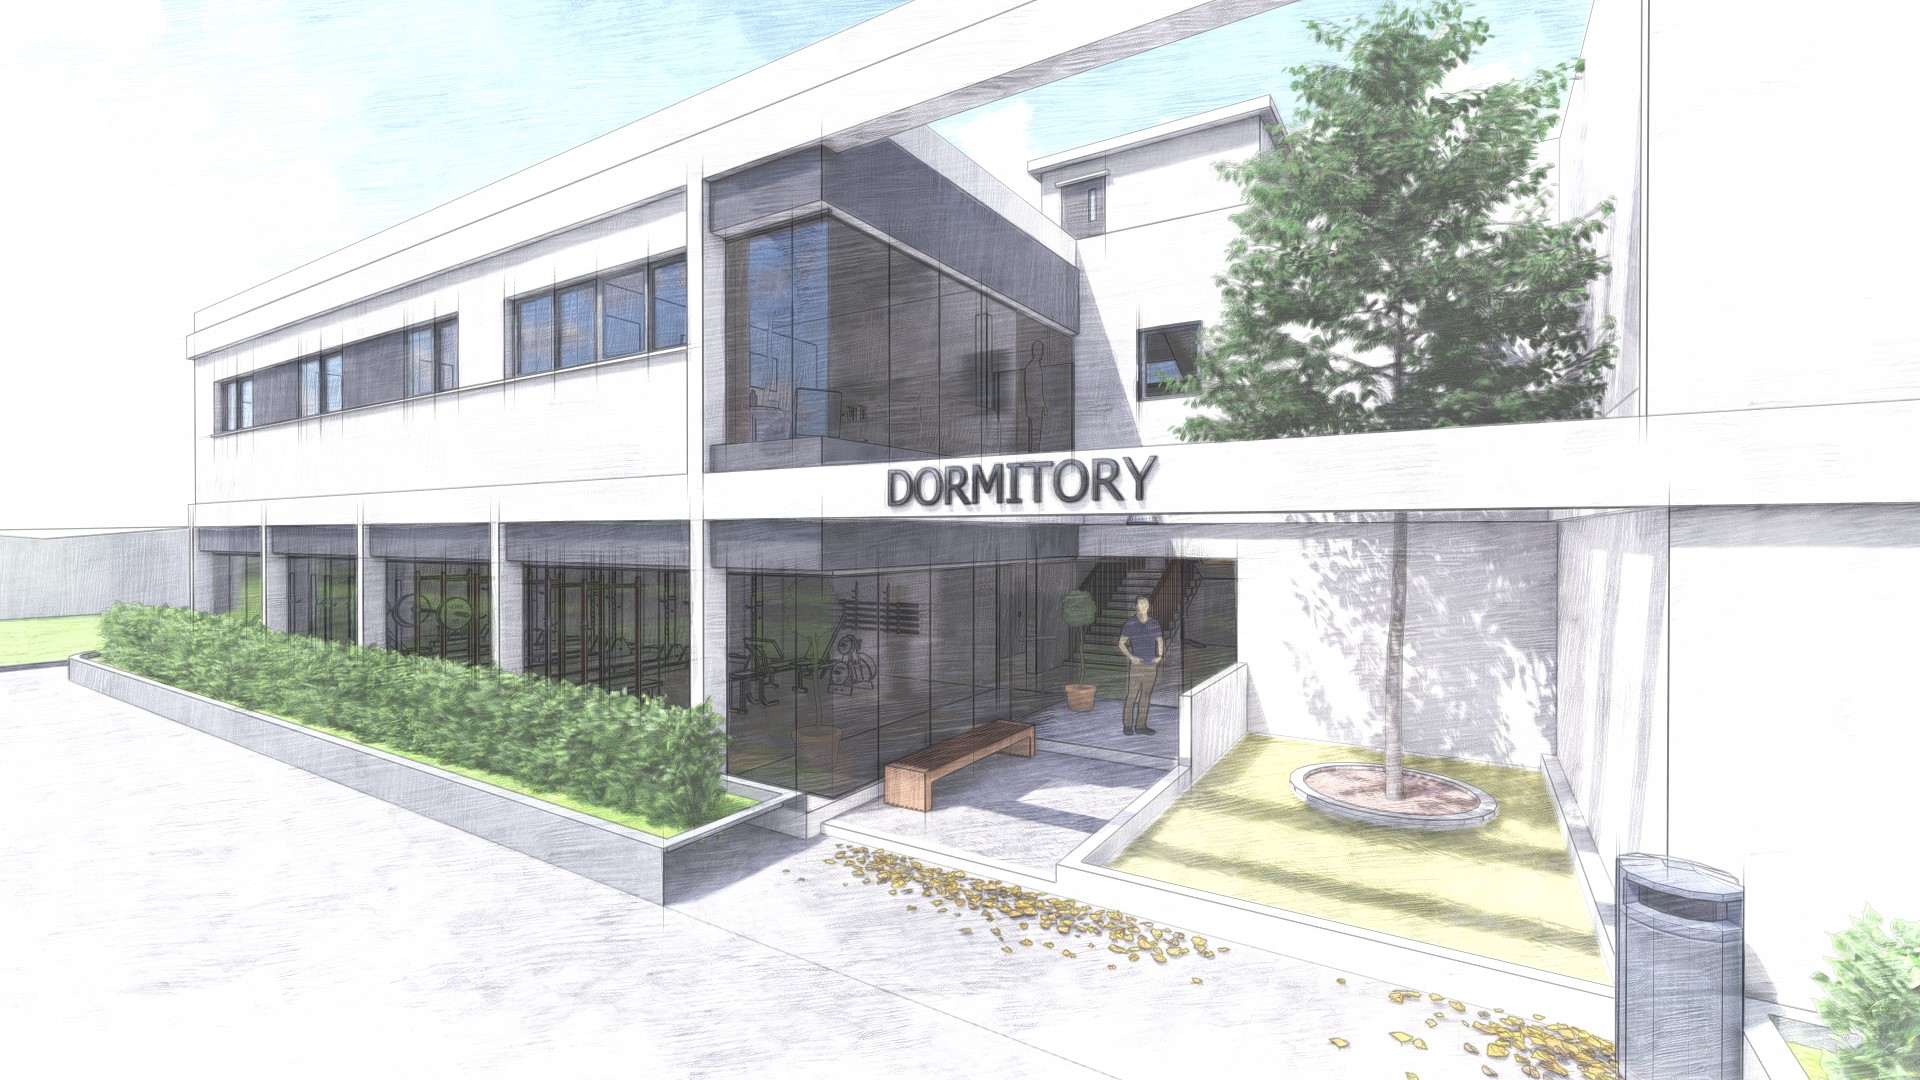 KMW - Dormitory Building